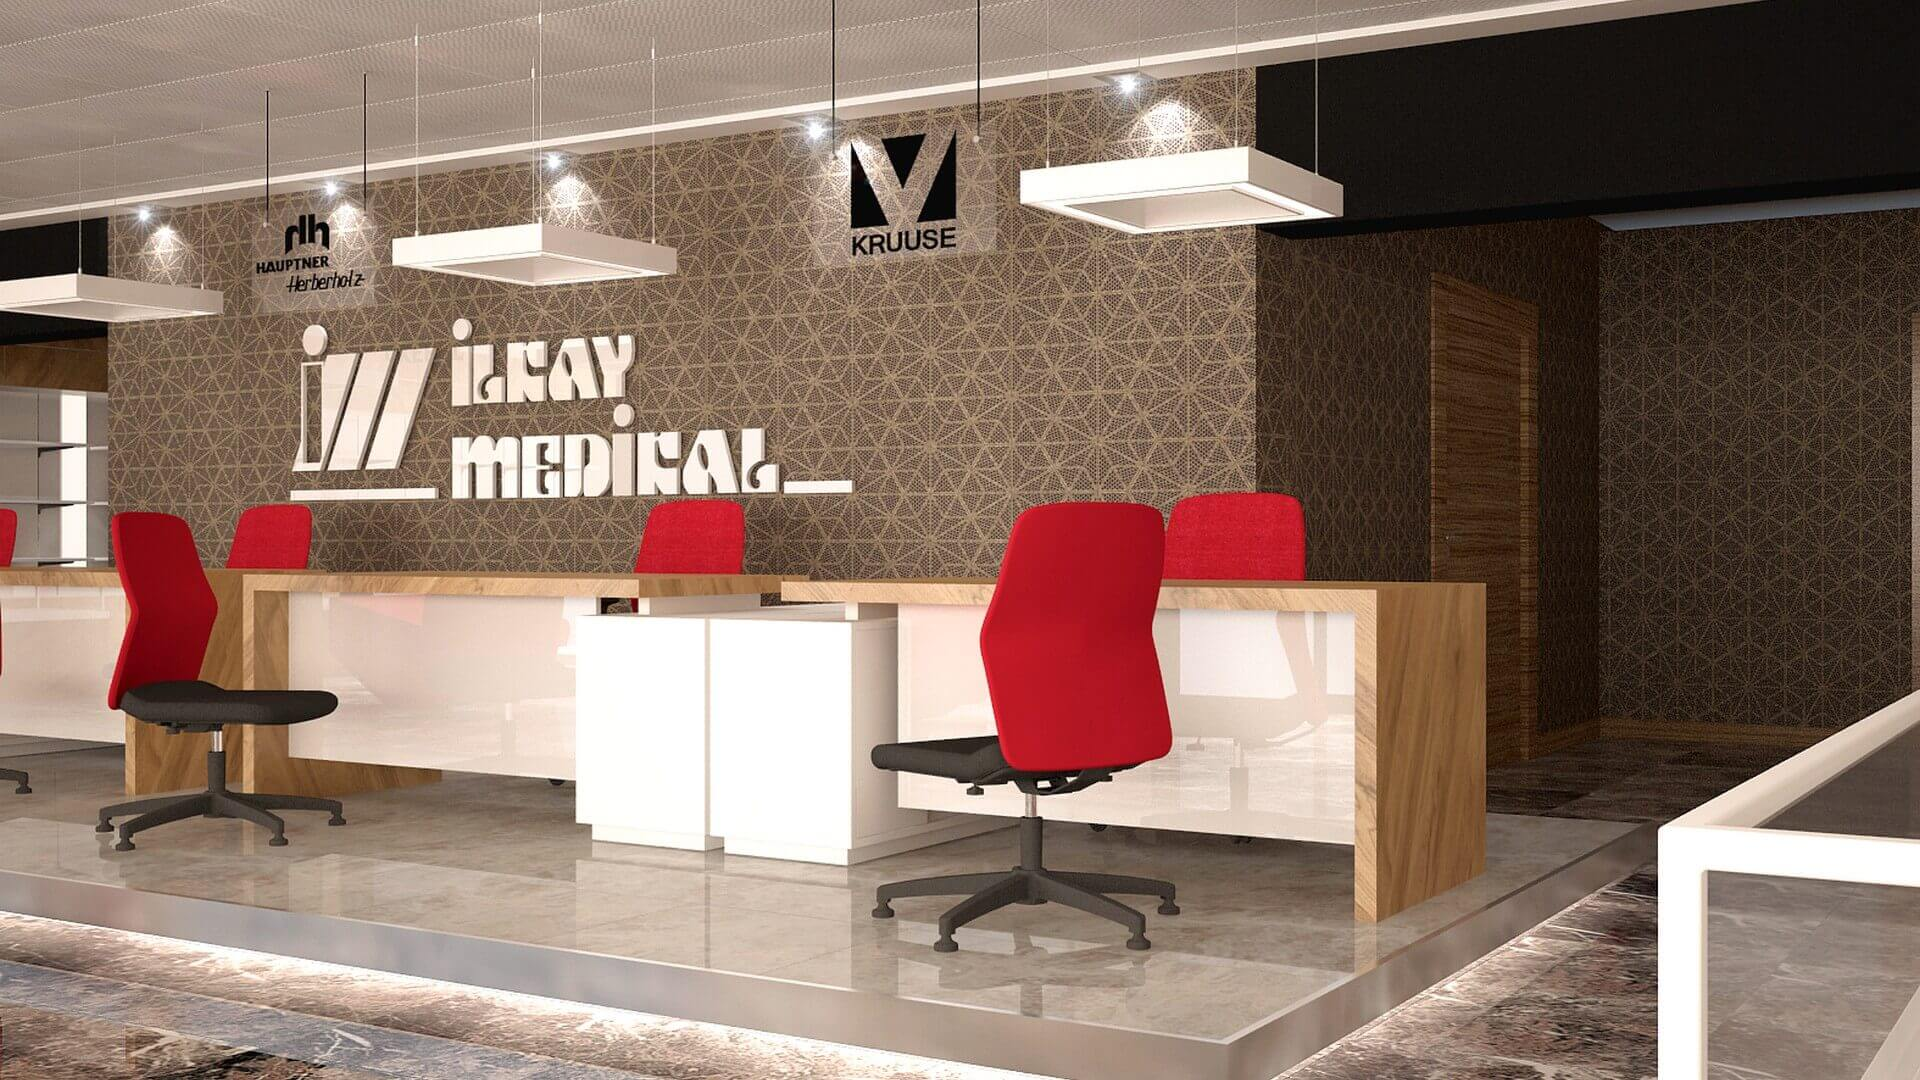 shop design 2025 Ilkay Medical Shop Retail